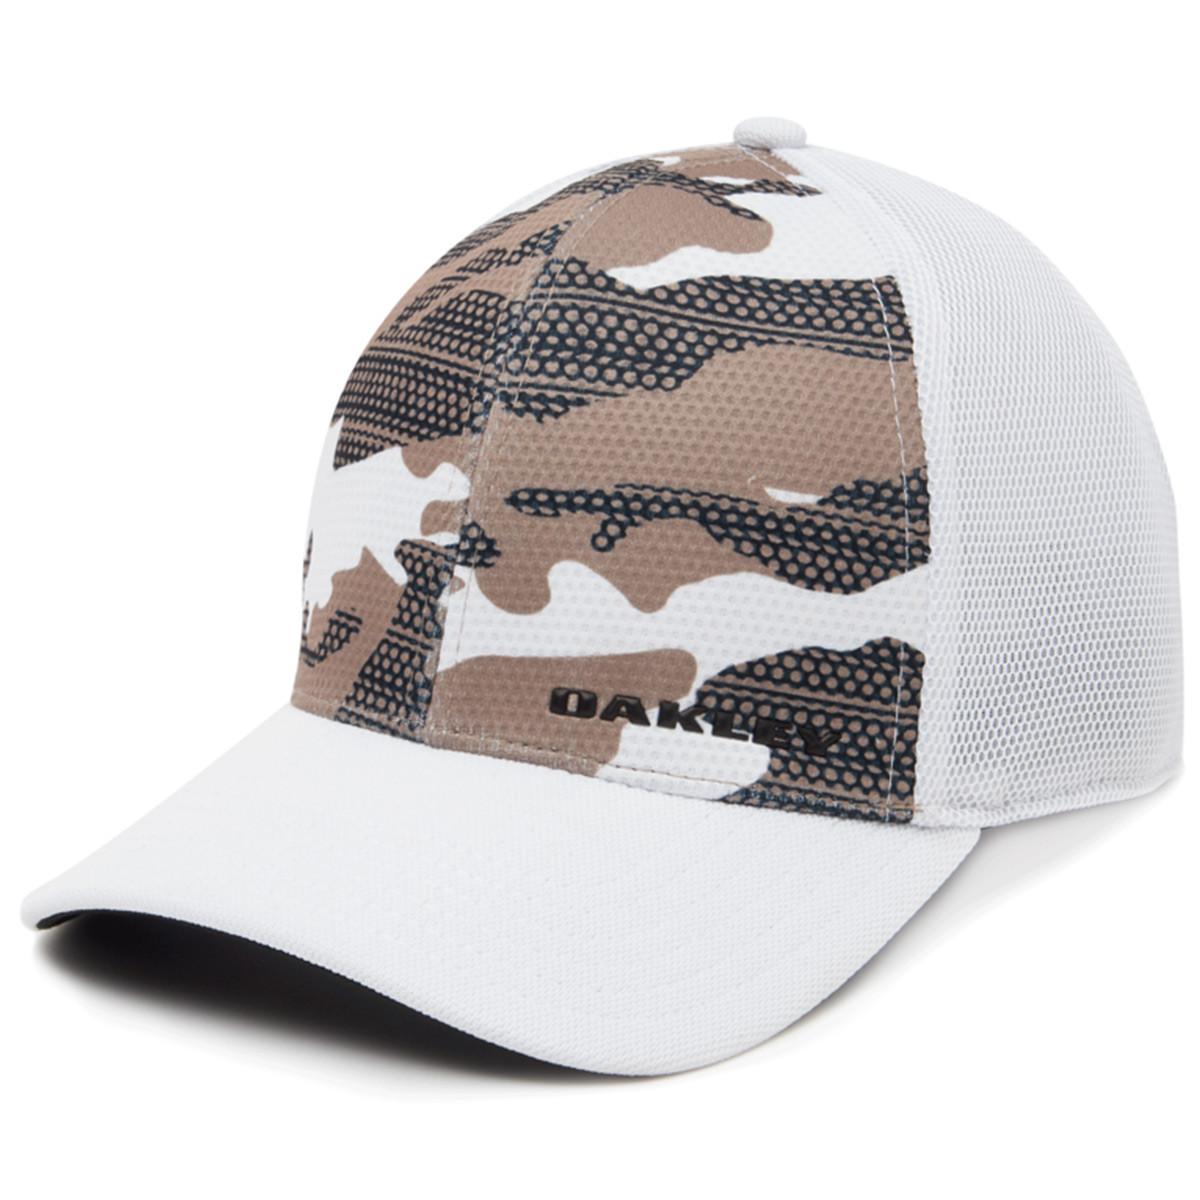 cfeba1395 Oakley Mens Silicon Bark Trucker Print 2.0 Cap - Headwear - Men - Chill